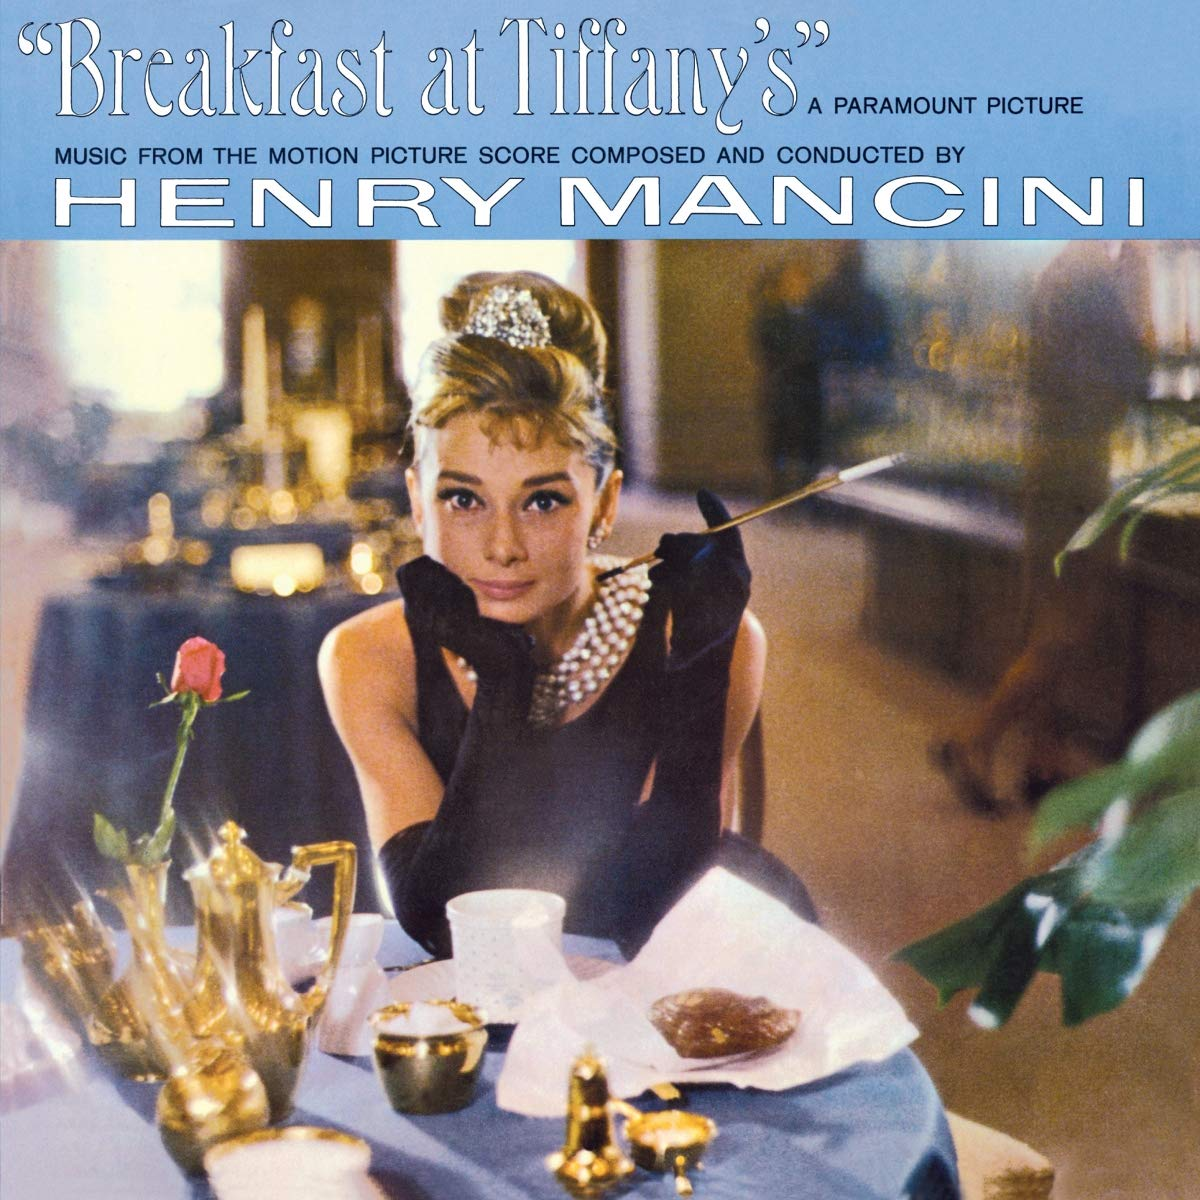 Vinilo : Henry Mancini - Breakfast At Tiffany's (original Soundtrack) (180 Gram Vinyl, Colored Vinyl, Limited Edition, Bonus Track, Remastered)